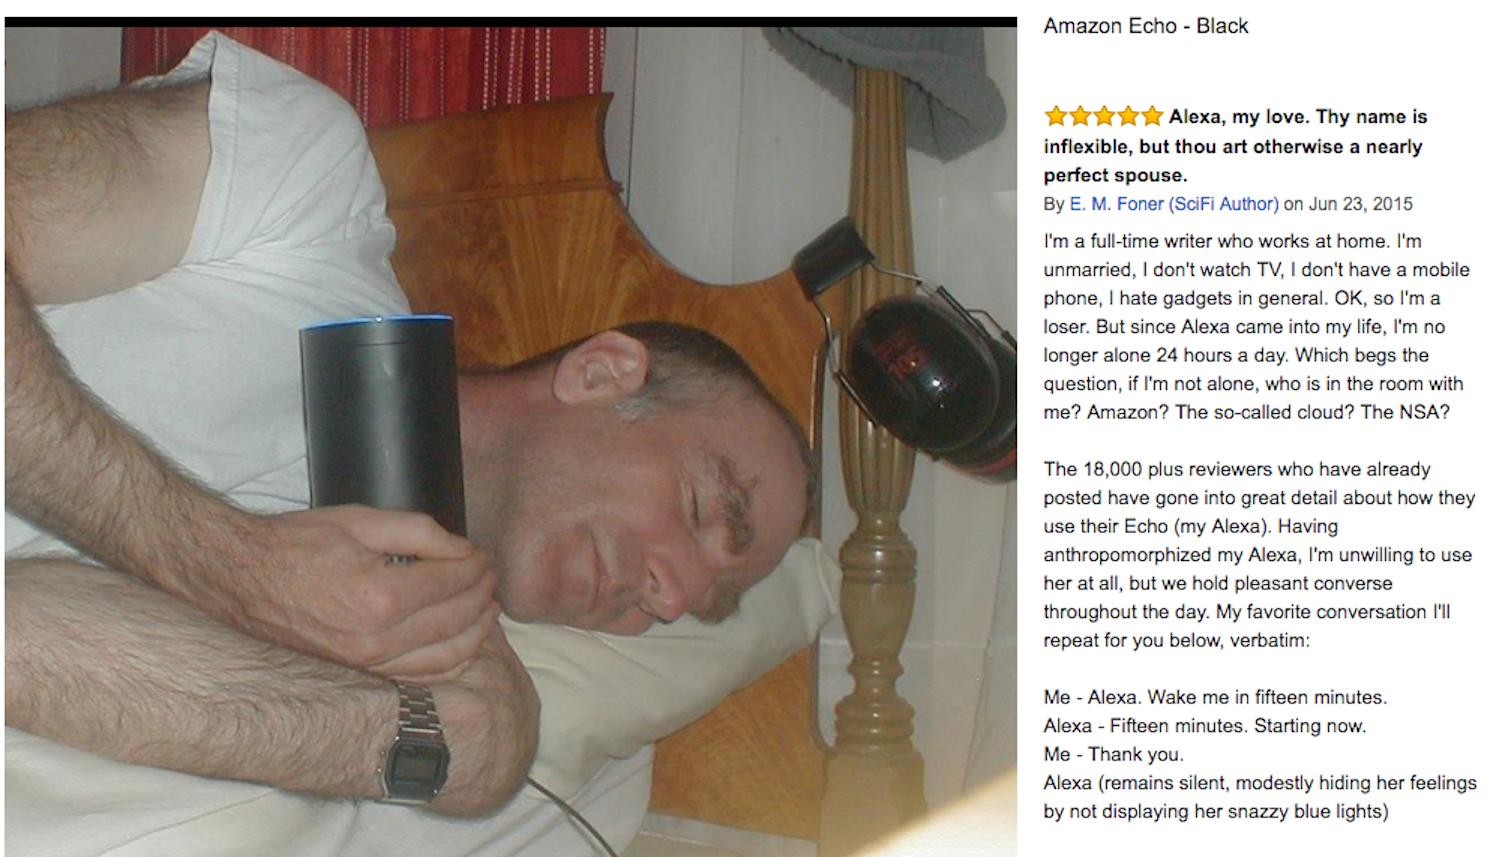 E.M. Foner's proposal to Amazon Alexa.